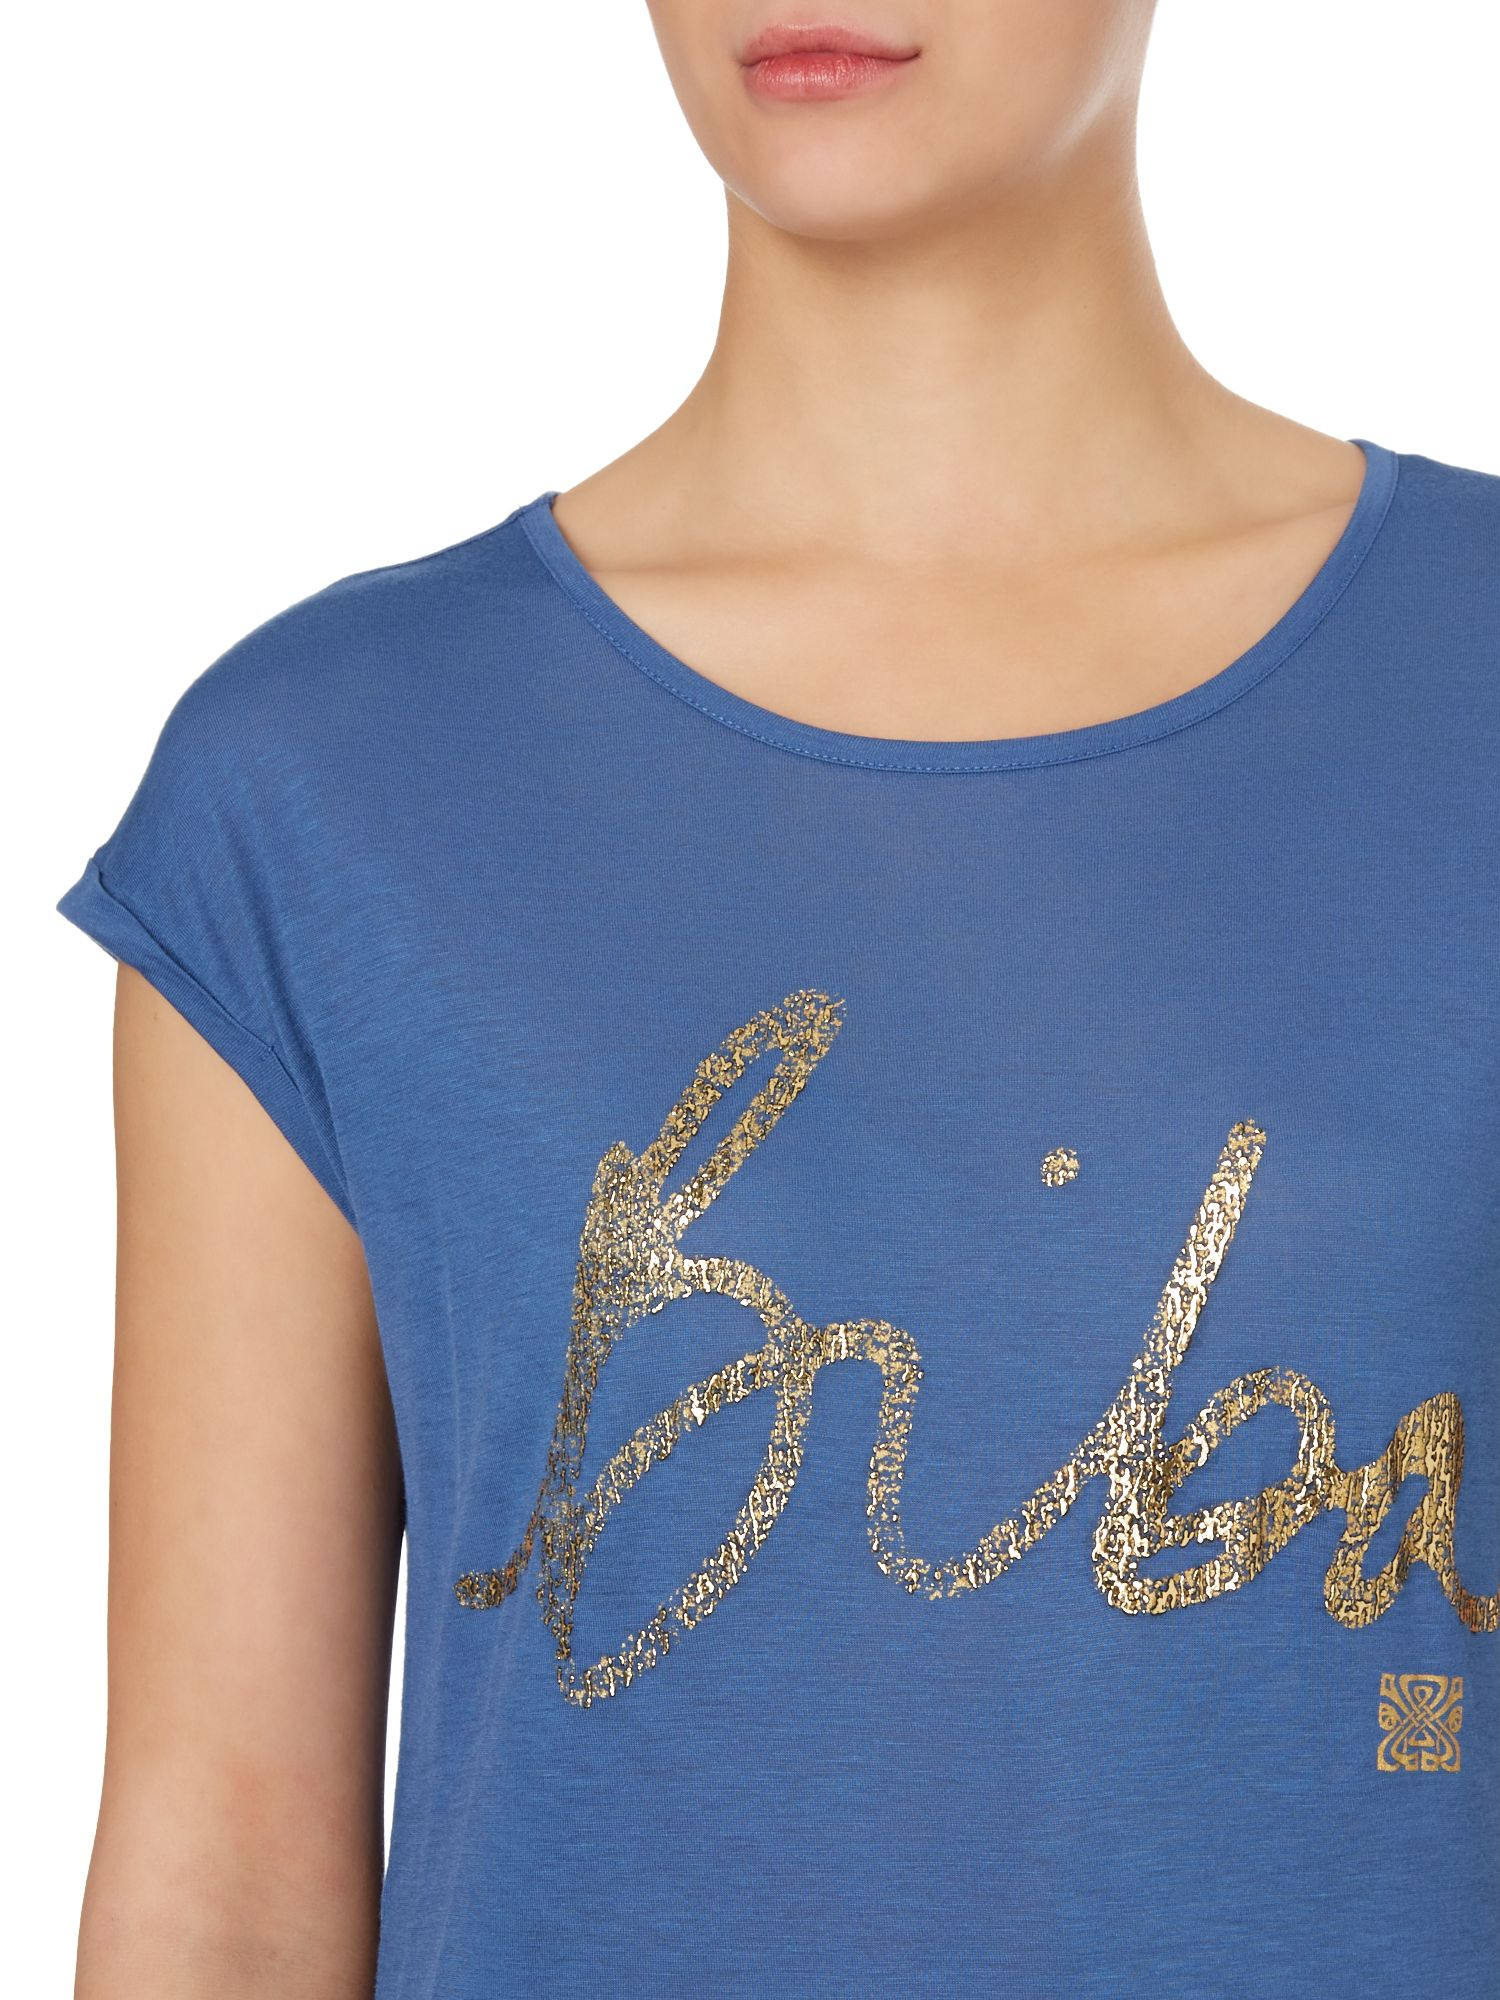 Lyst biba foil print t shirt in blue for Foil print t shirts custom